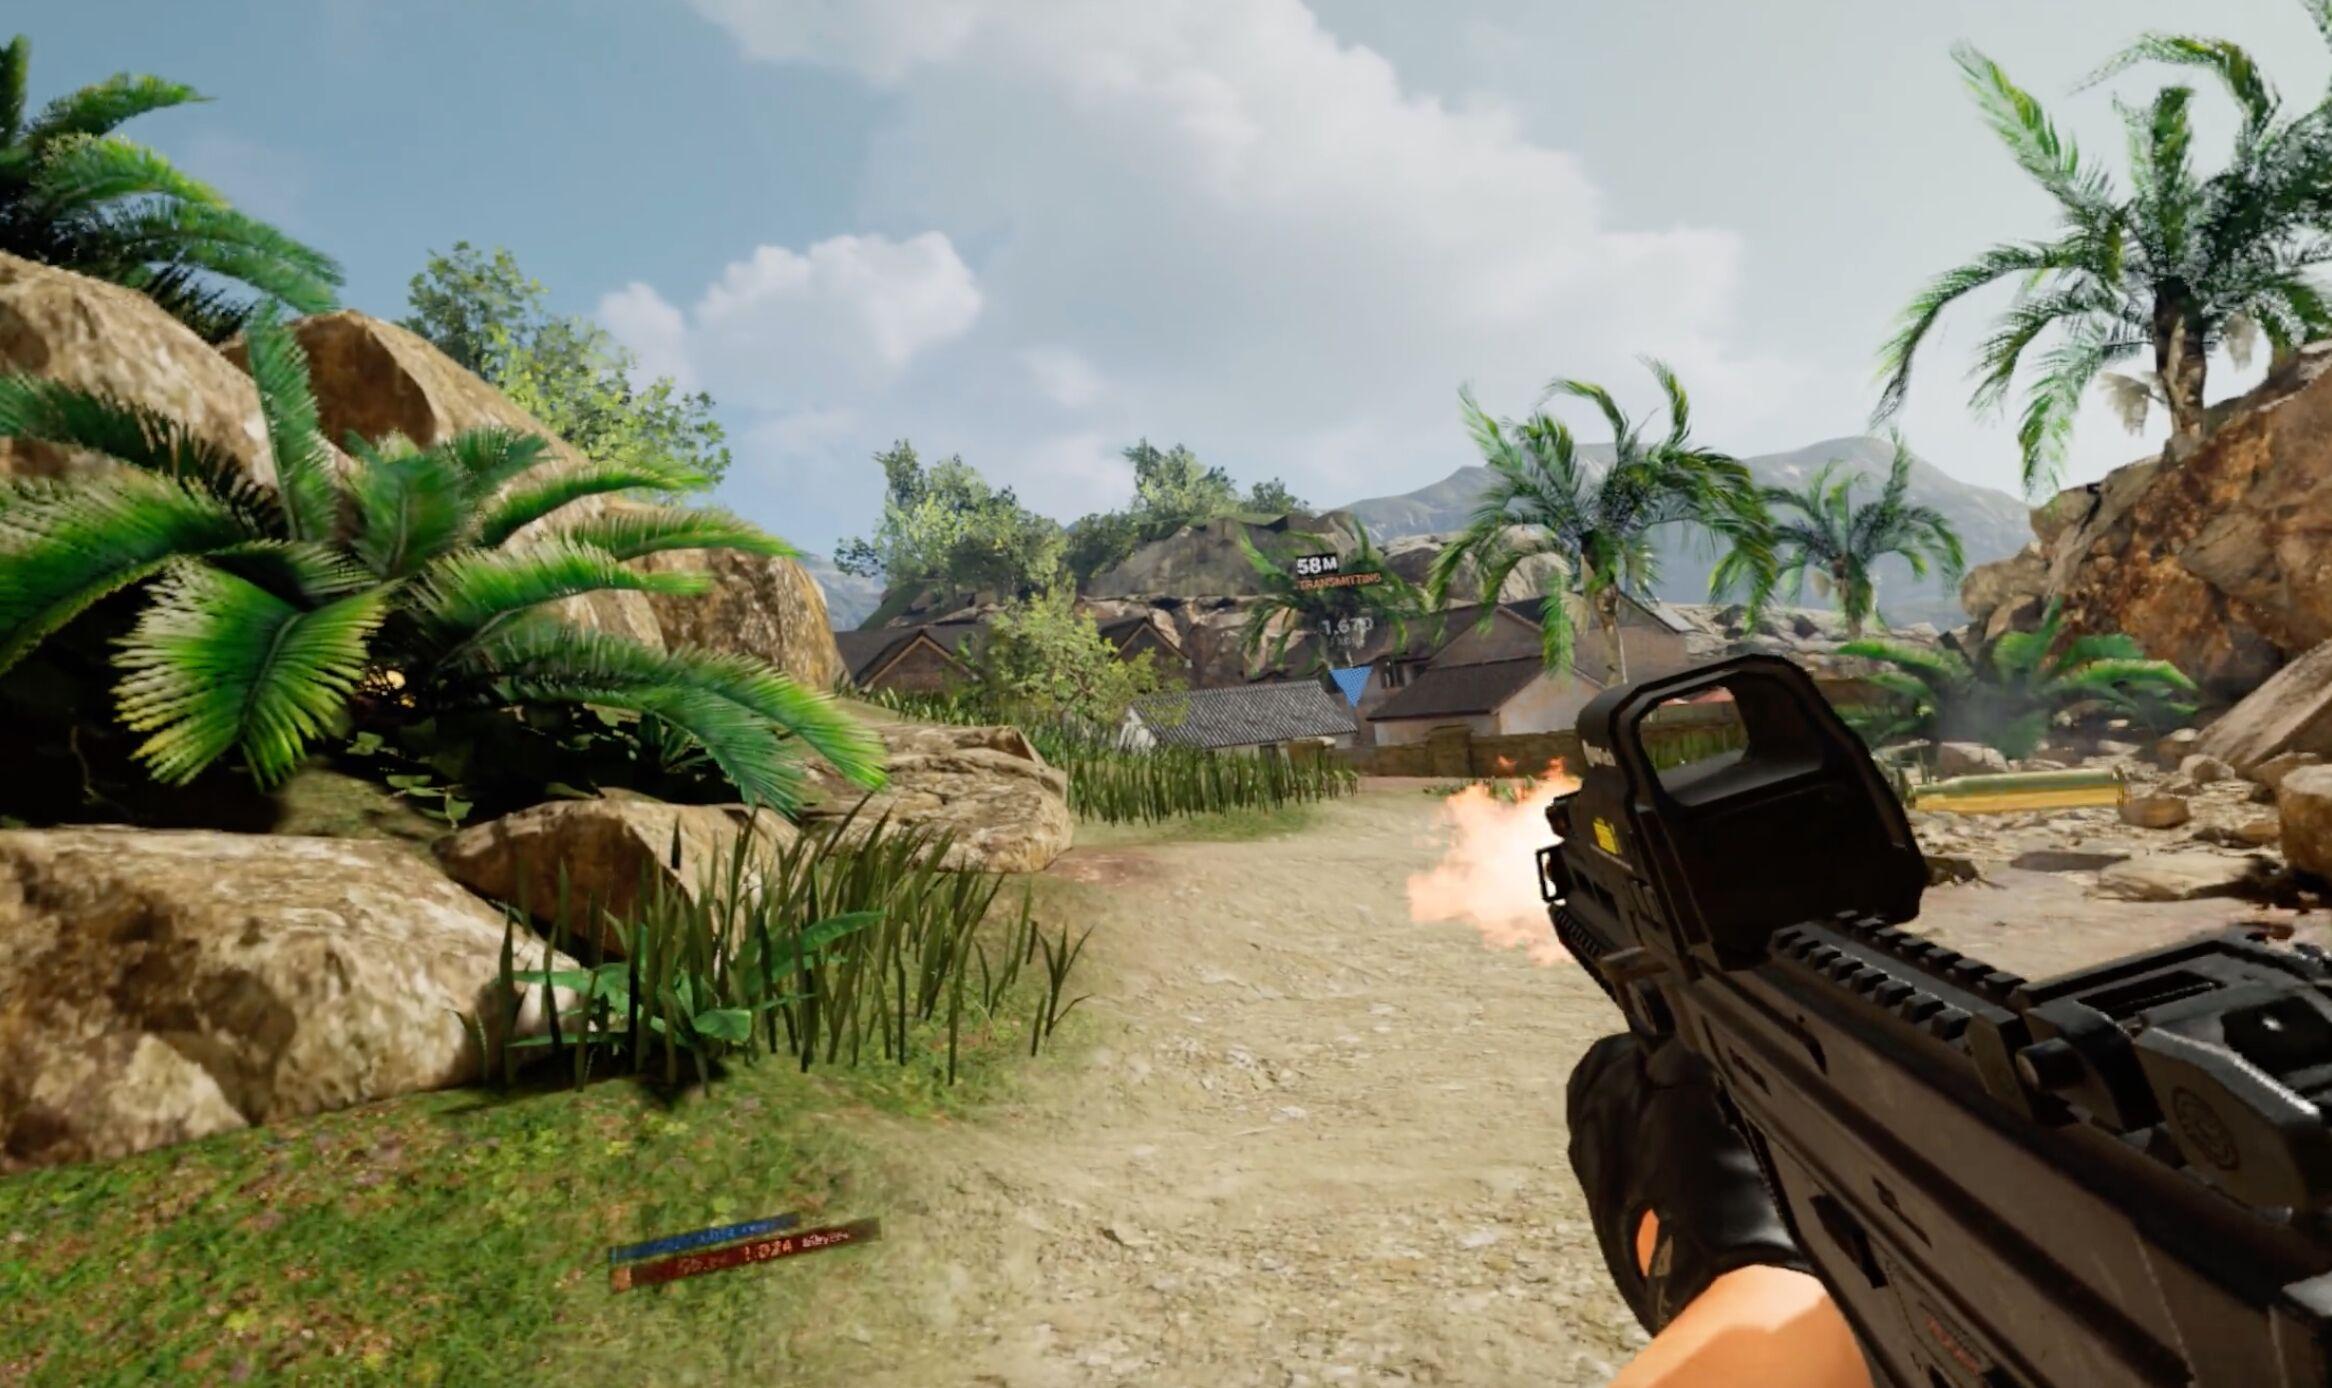 Contractors通过令人惊叹的画面和精心打磨的枪战要素推动vr射击游戏发展